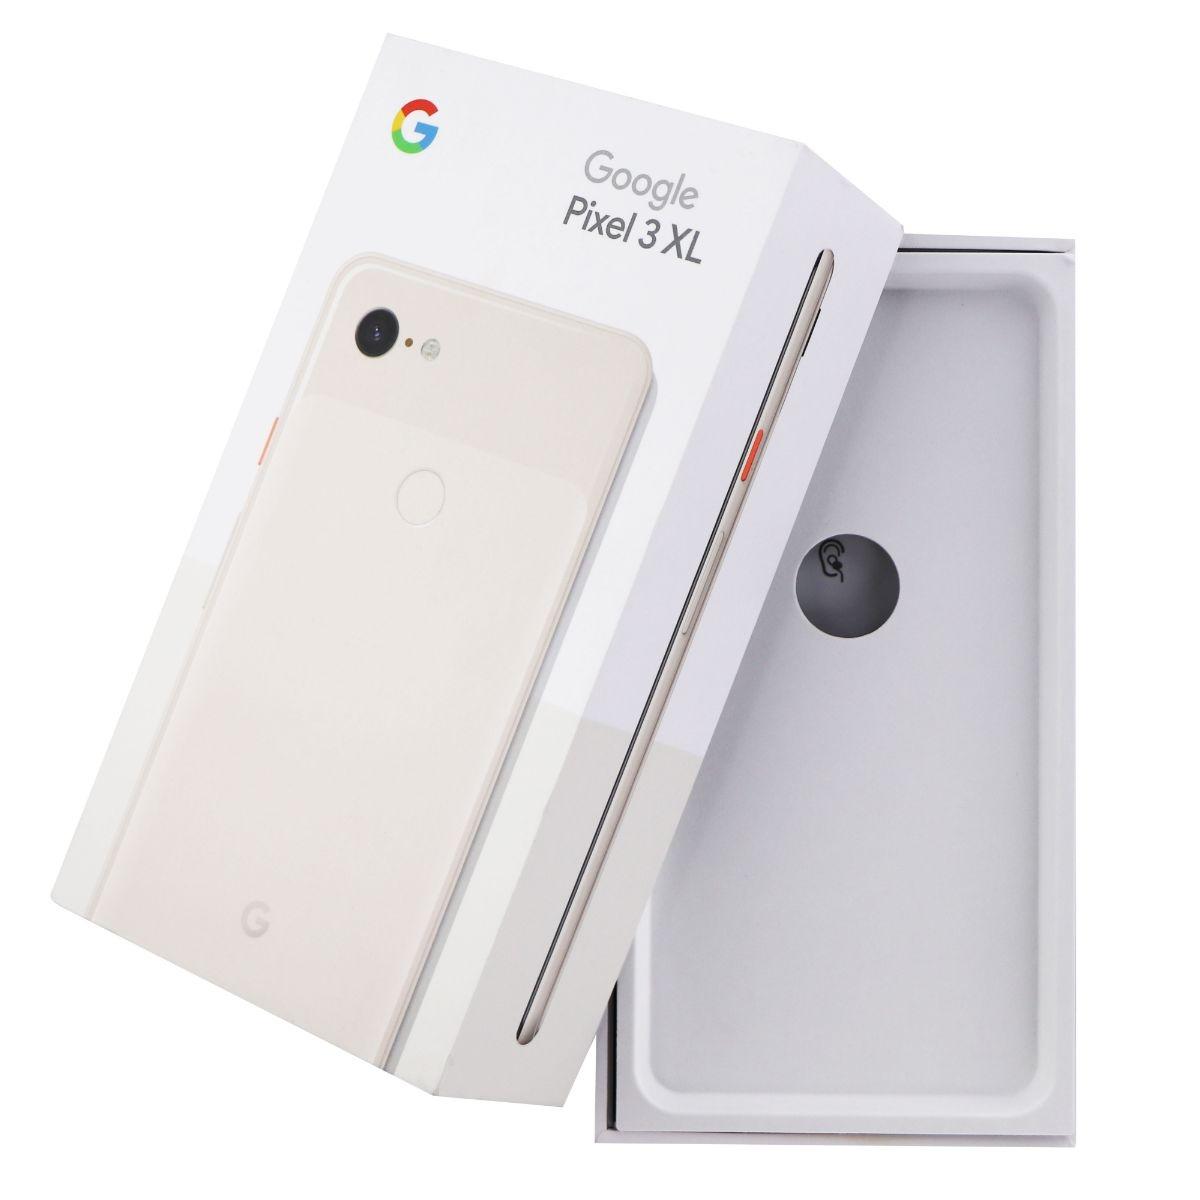 RETAIL BOX - Google Pixel 3 XL - 128GB Not Pink - NO DEVICE